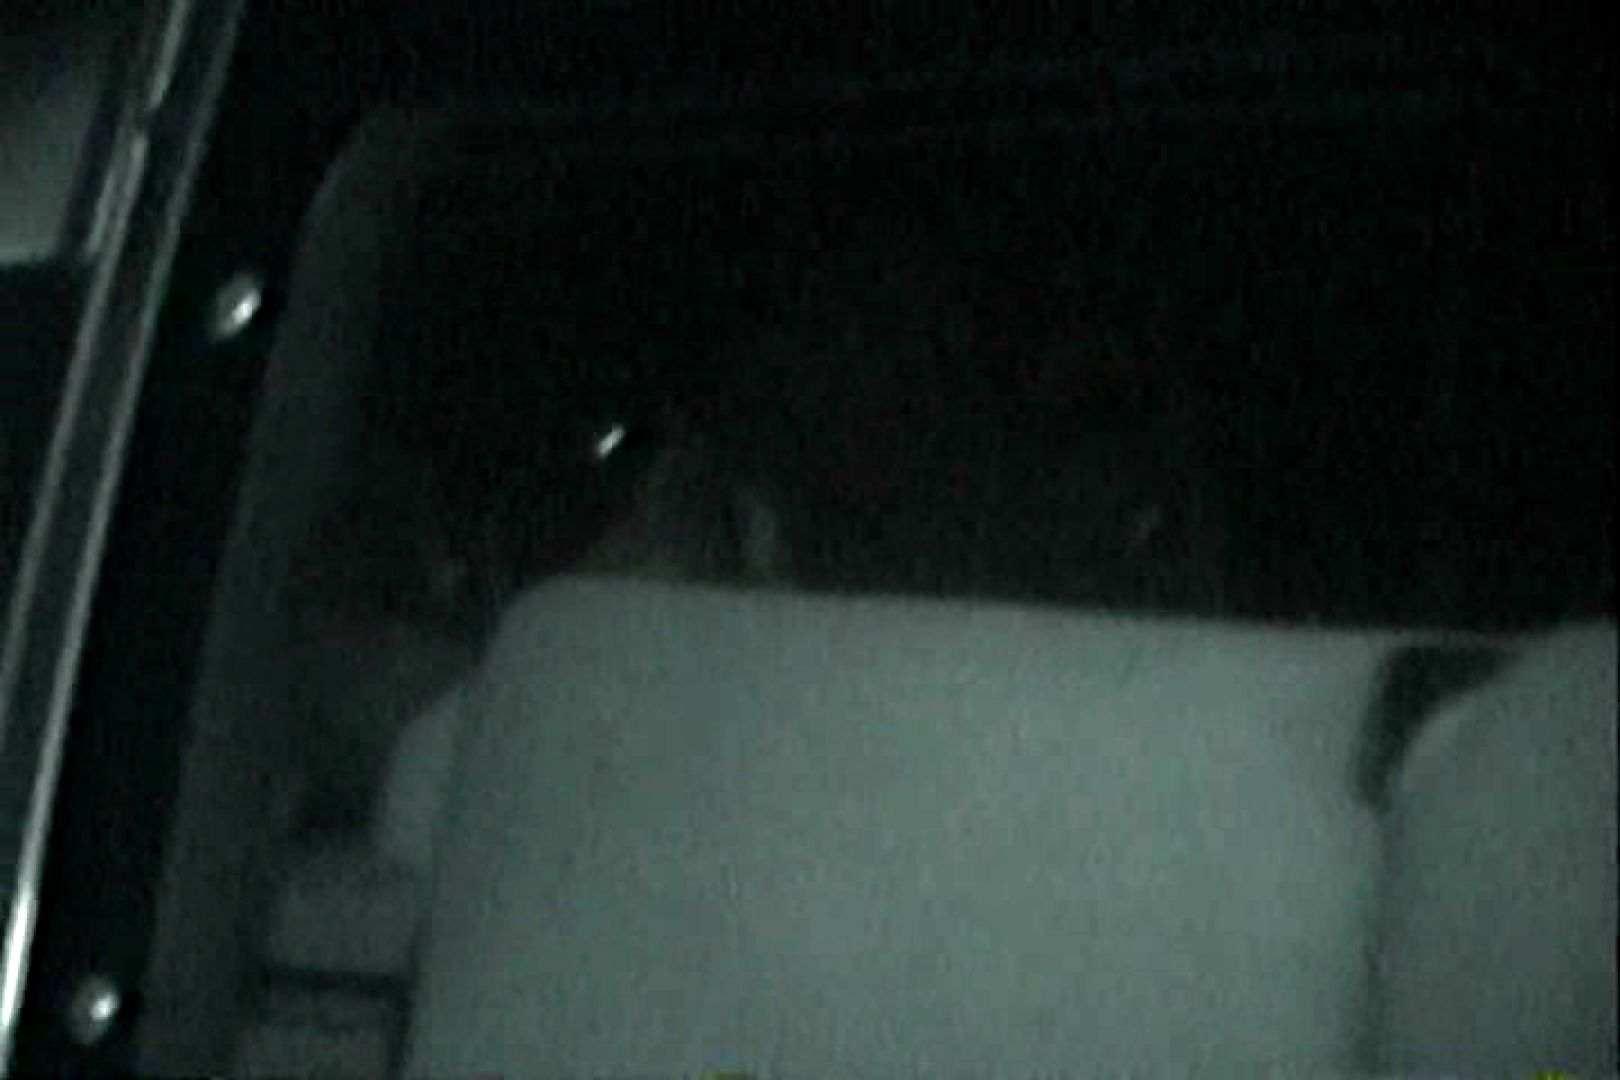 充血監督の深夜の運動会Vol.129 赤外線 オマンコ無修正動画無料 81連発 18